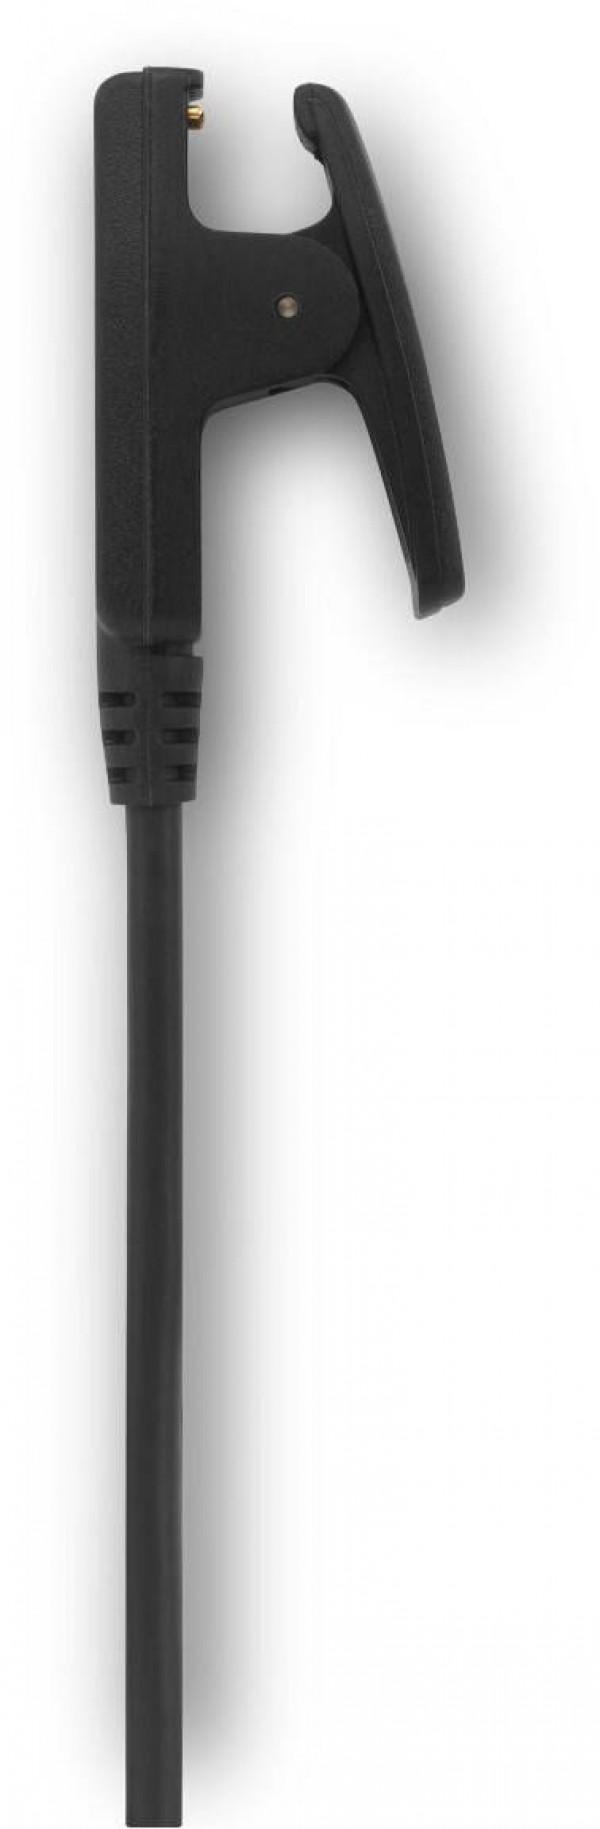 GARMIN USB-latausjohto 010-11029-19